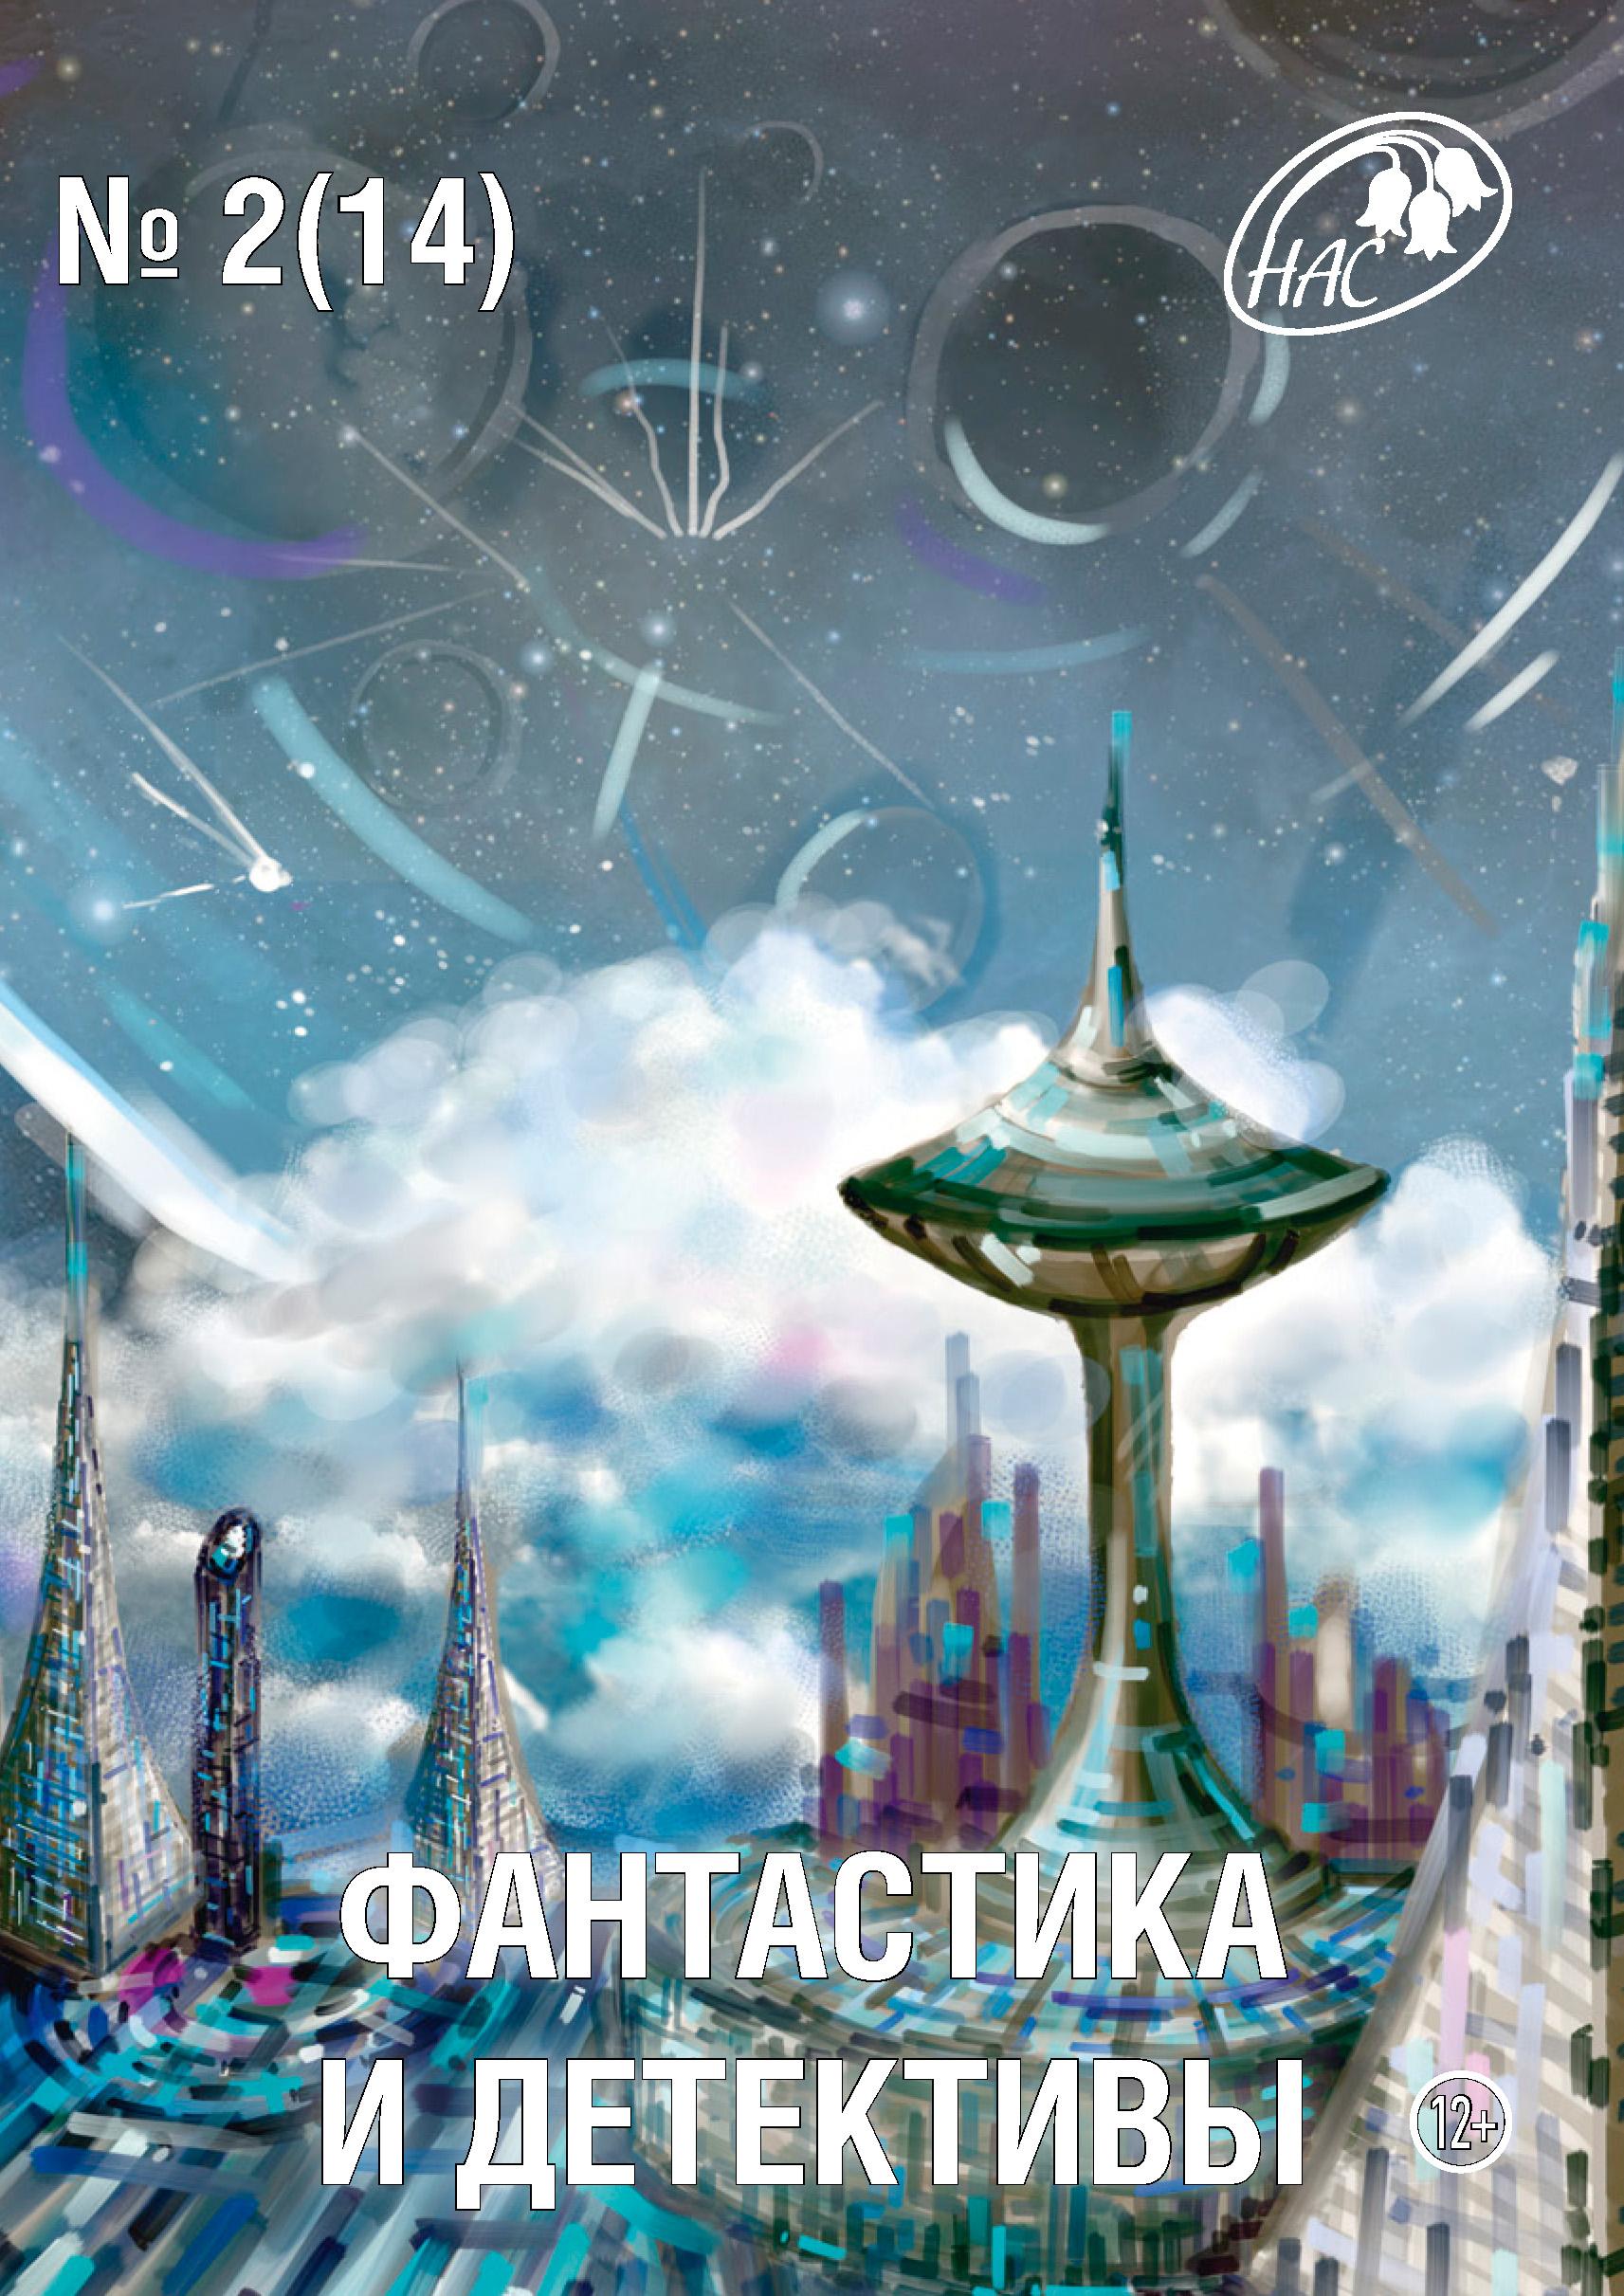 Сборник Журнал «Фантастика и Детективы» №2 (14) 2014 сборник журнал фантастика и детективы 6 18 2014